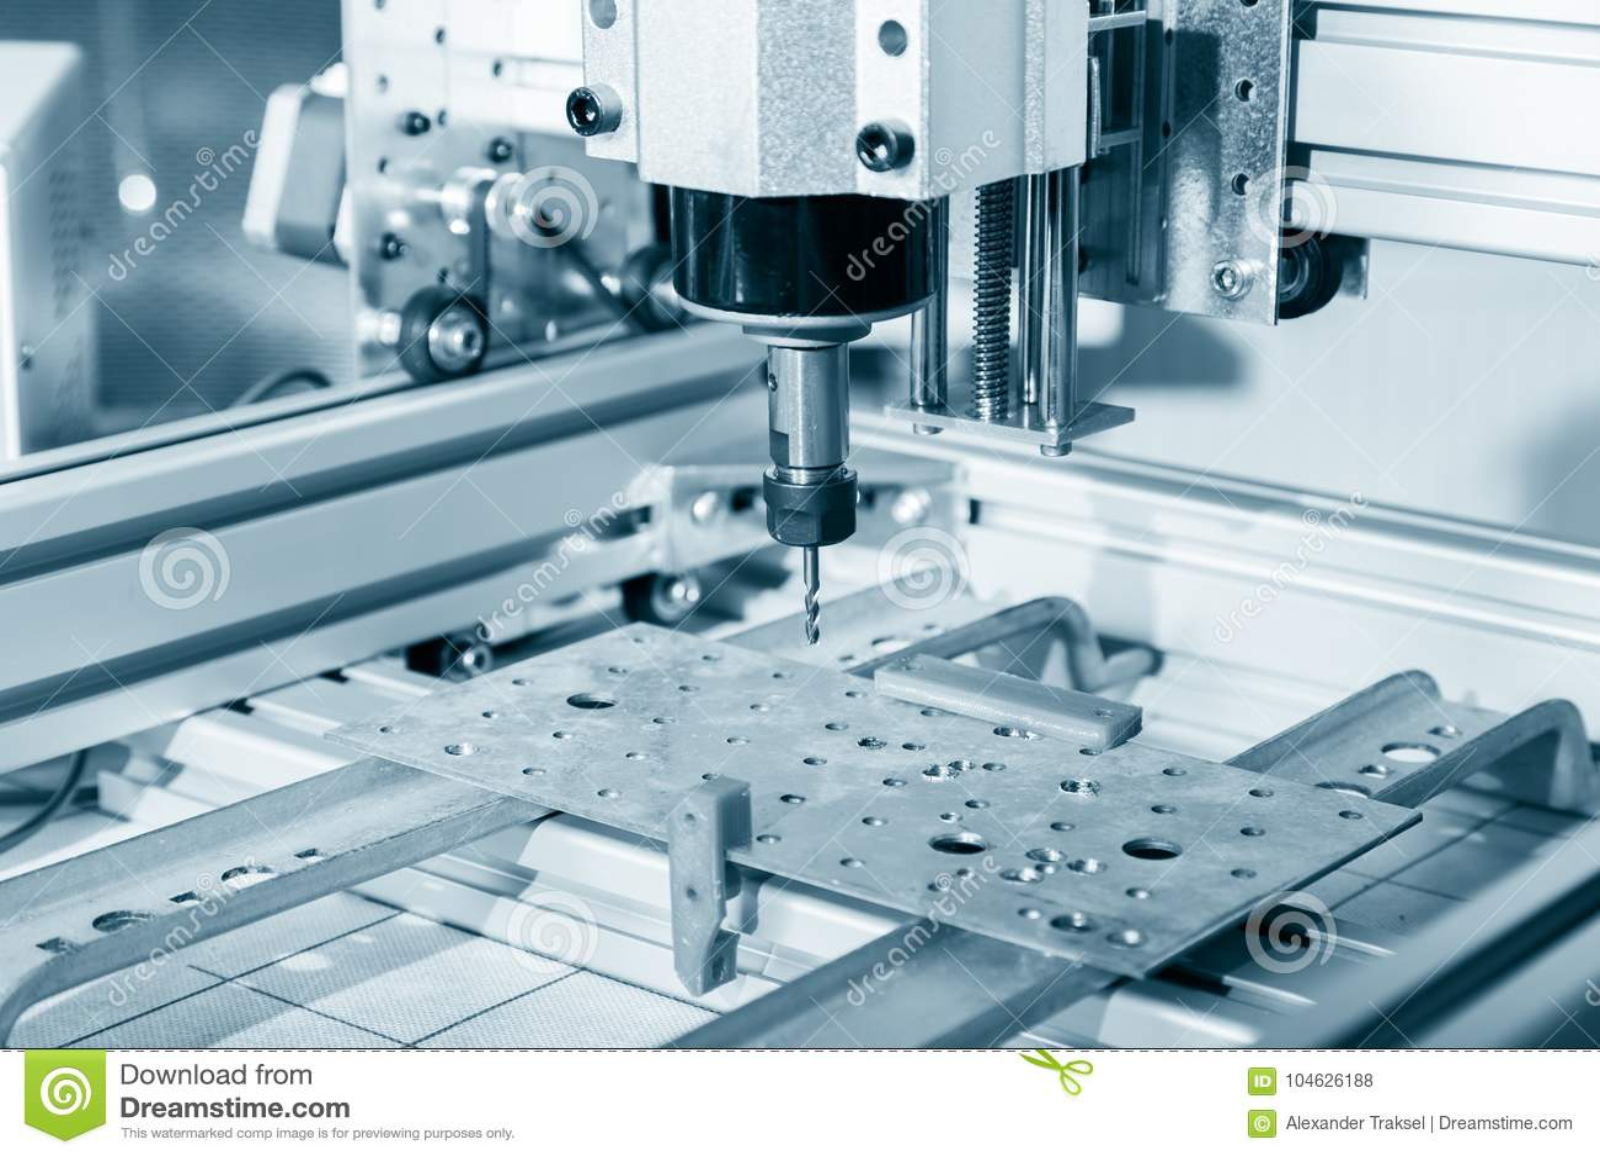 Download Malenmachine Die Aan Staaldetail Werken CNC Malenmachine Die, Snijdende Metaalbewerking Processn Werken Stock Foto - Afbeelding bestaande uit productie, snijder: 104626188